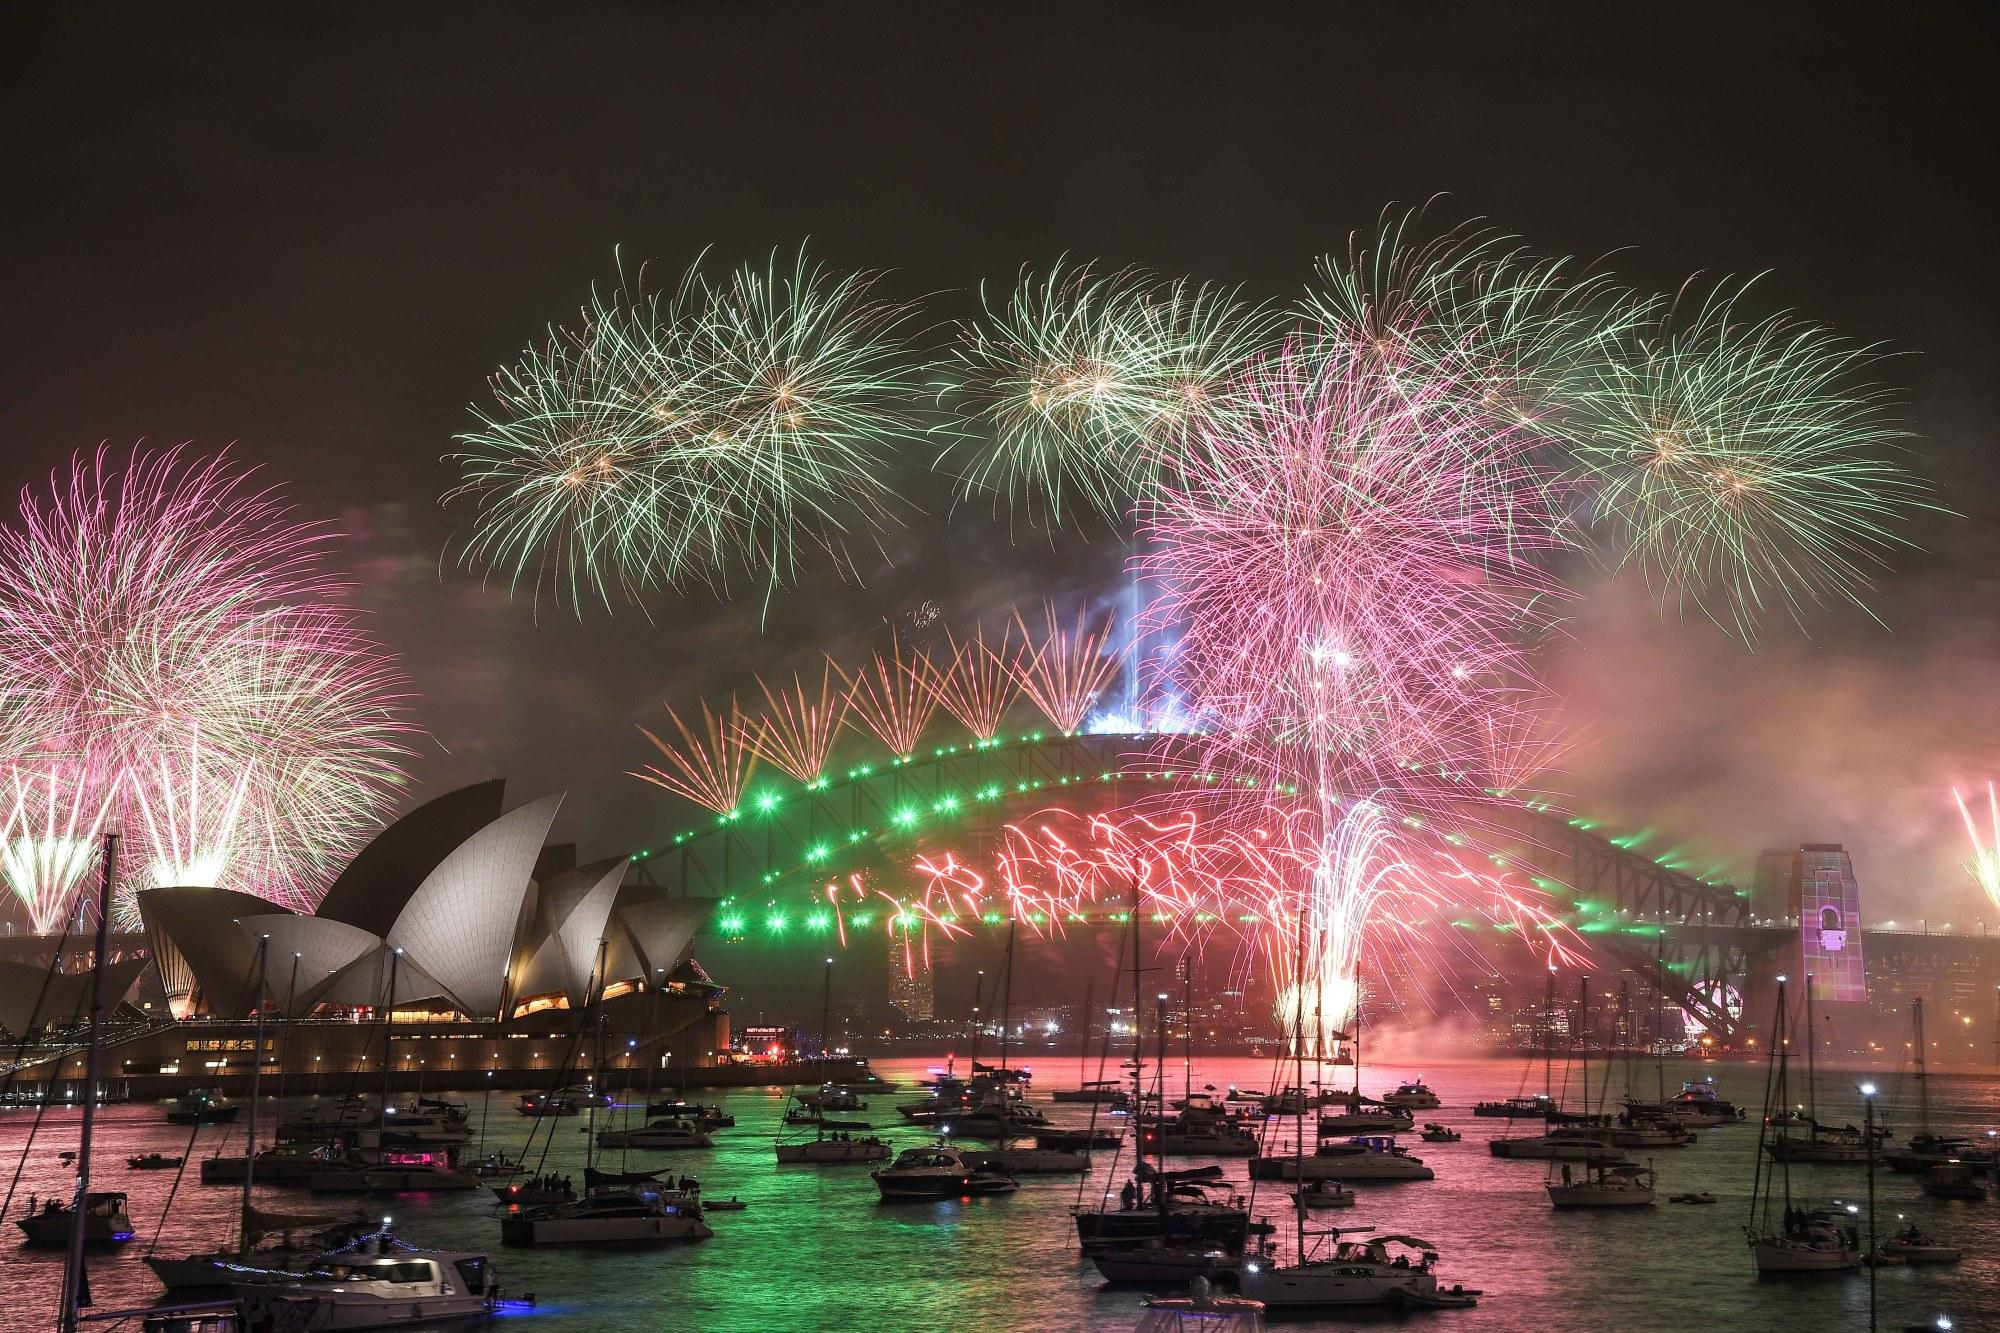 New Year's 2020 celebrations